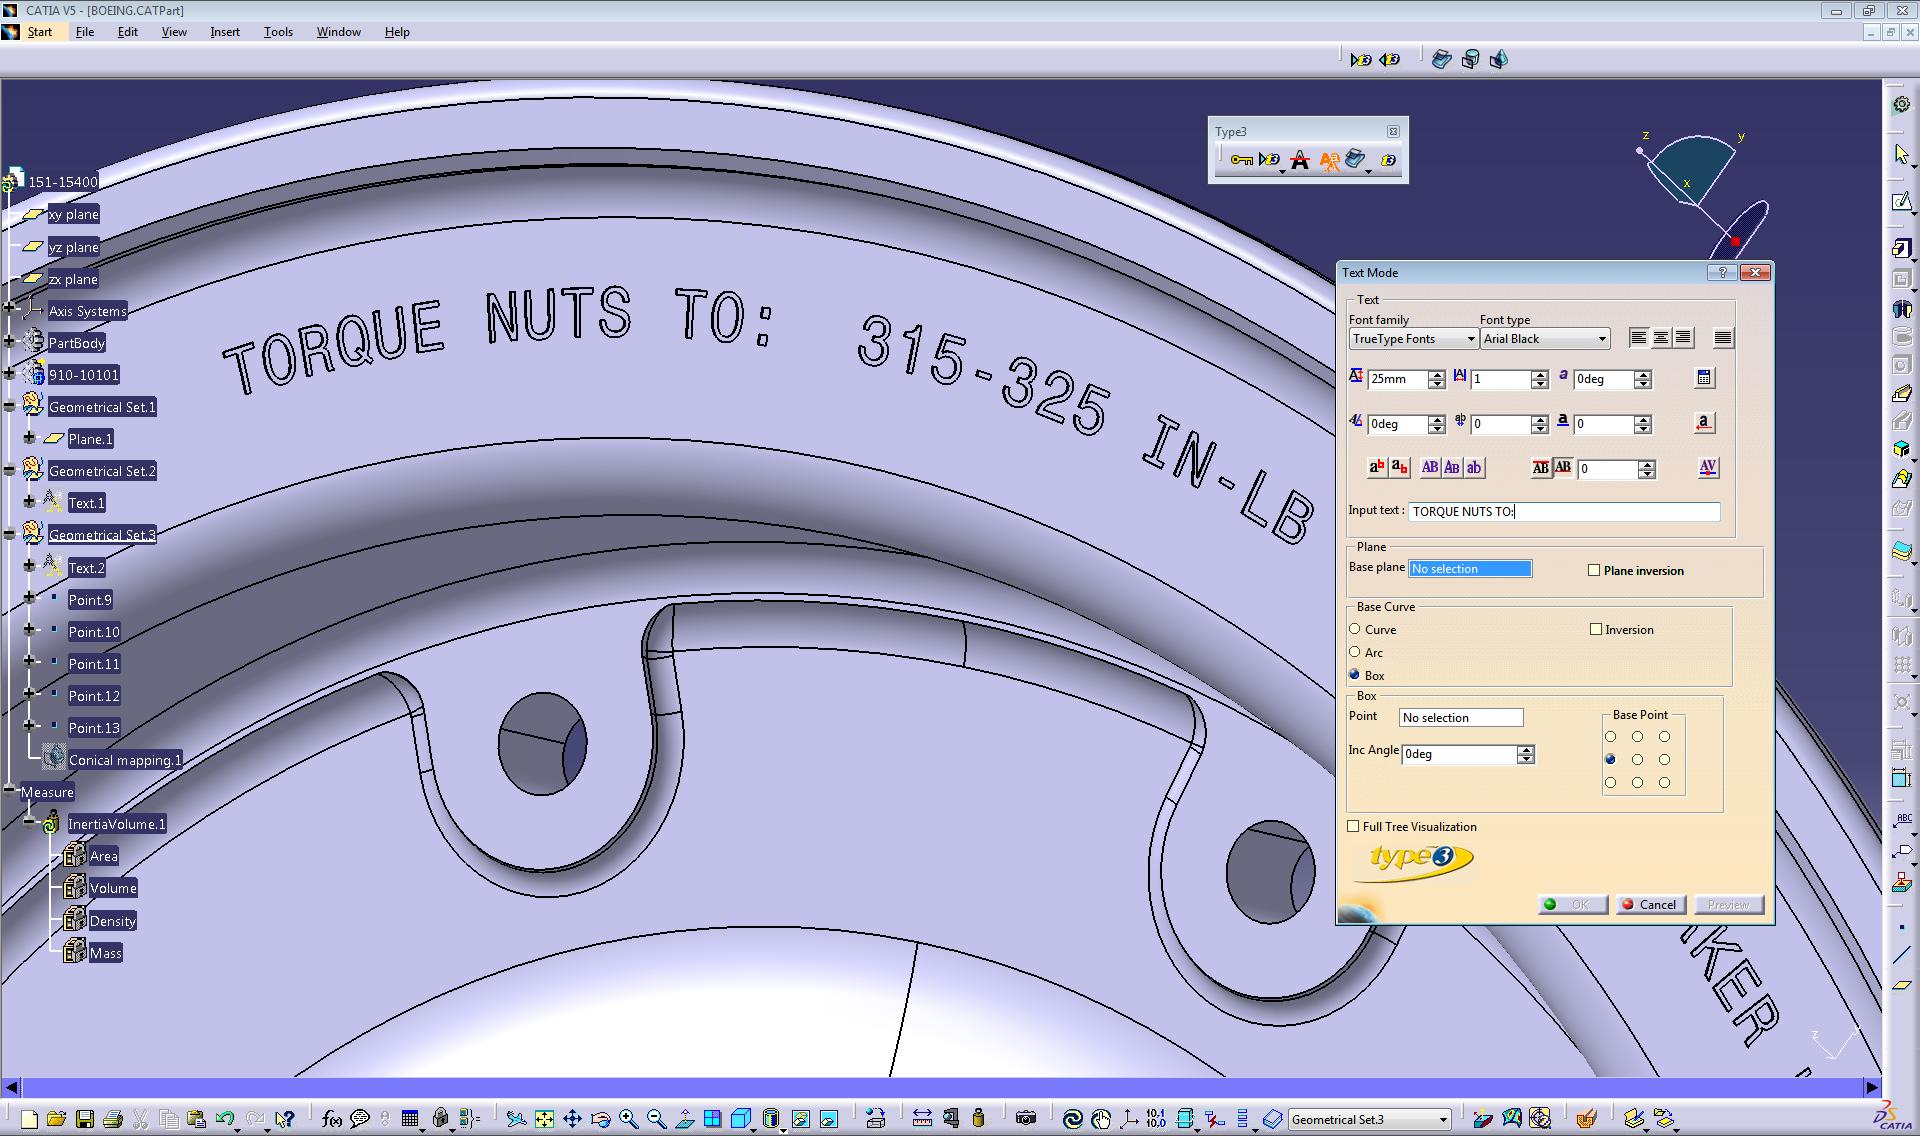 type3 caa v5 environment in catia v5 showing a text on a curve rh pinterest com Catia Ojeda Catia Icon